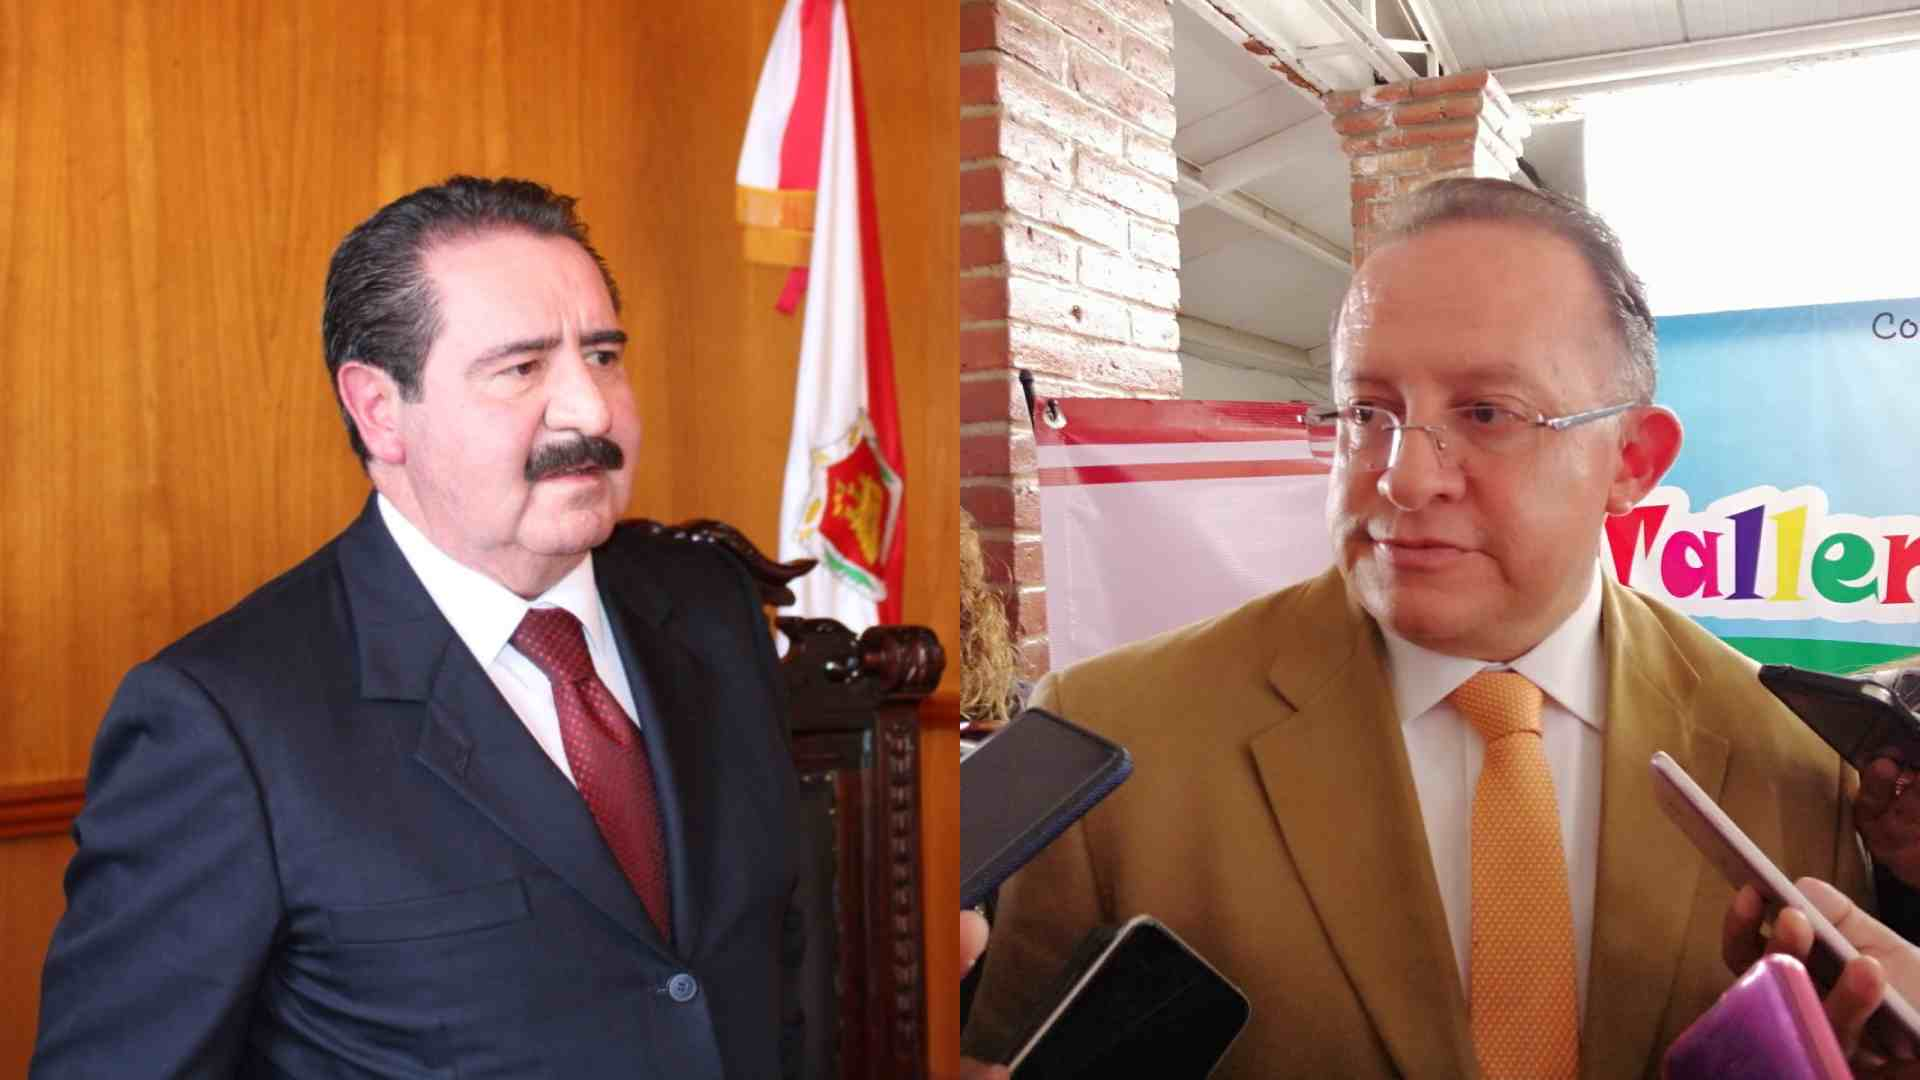 TSJE-Victor Manuel Cid del Prado-CEDH-Derechos Humanos-Ombudbsperson- Ombudbsman